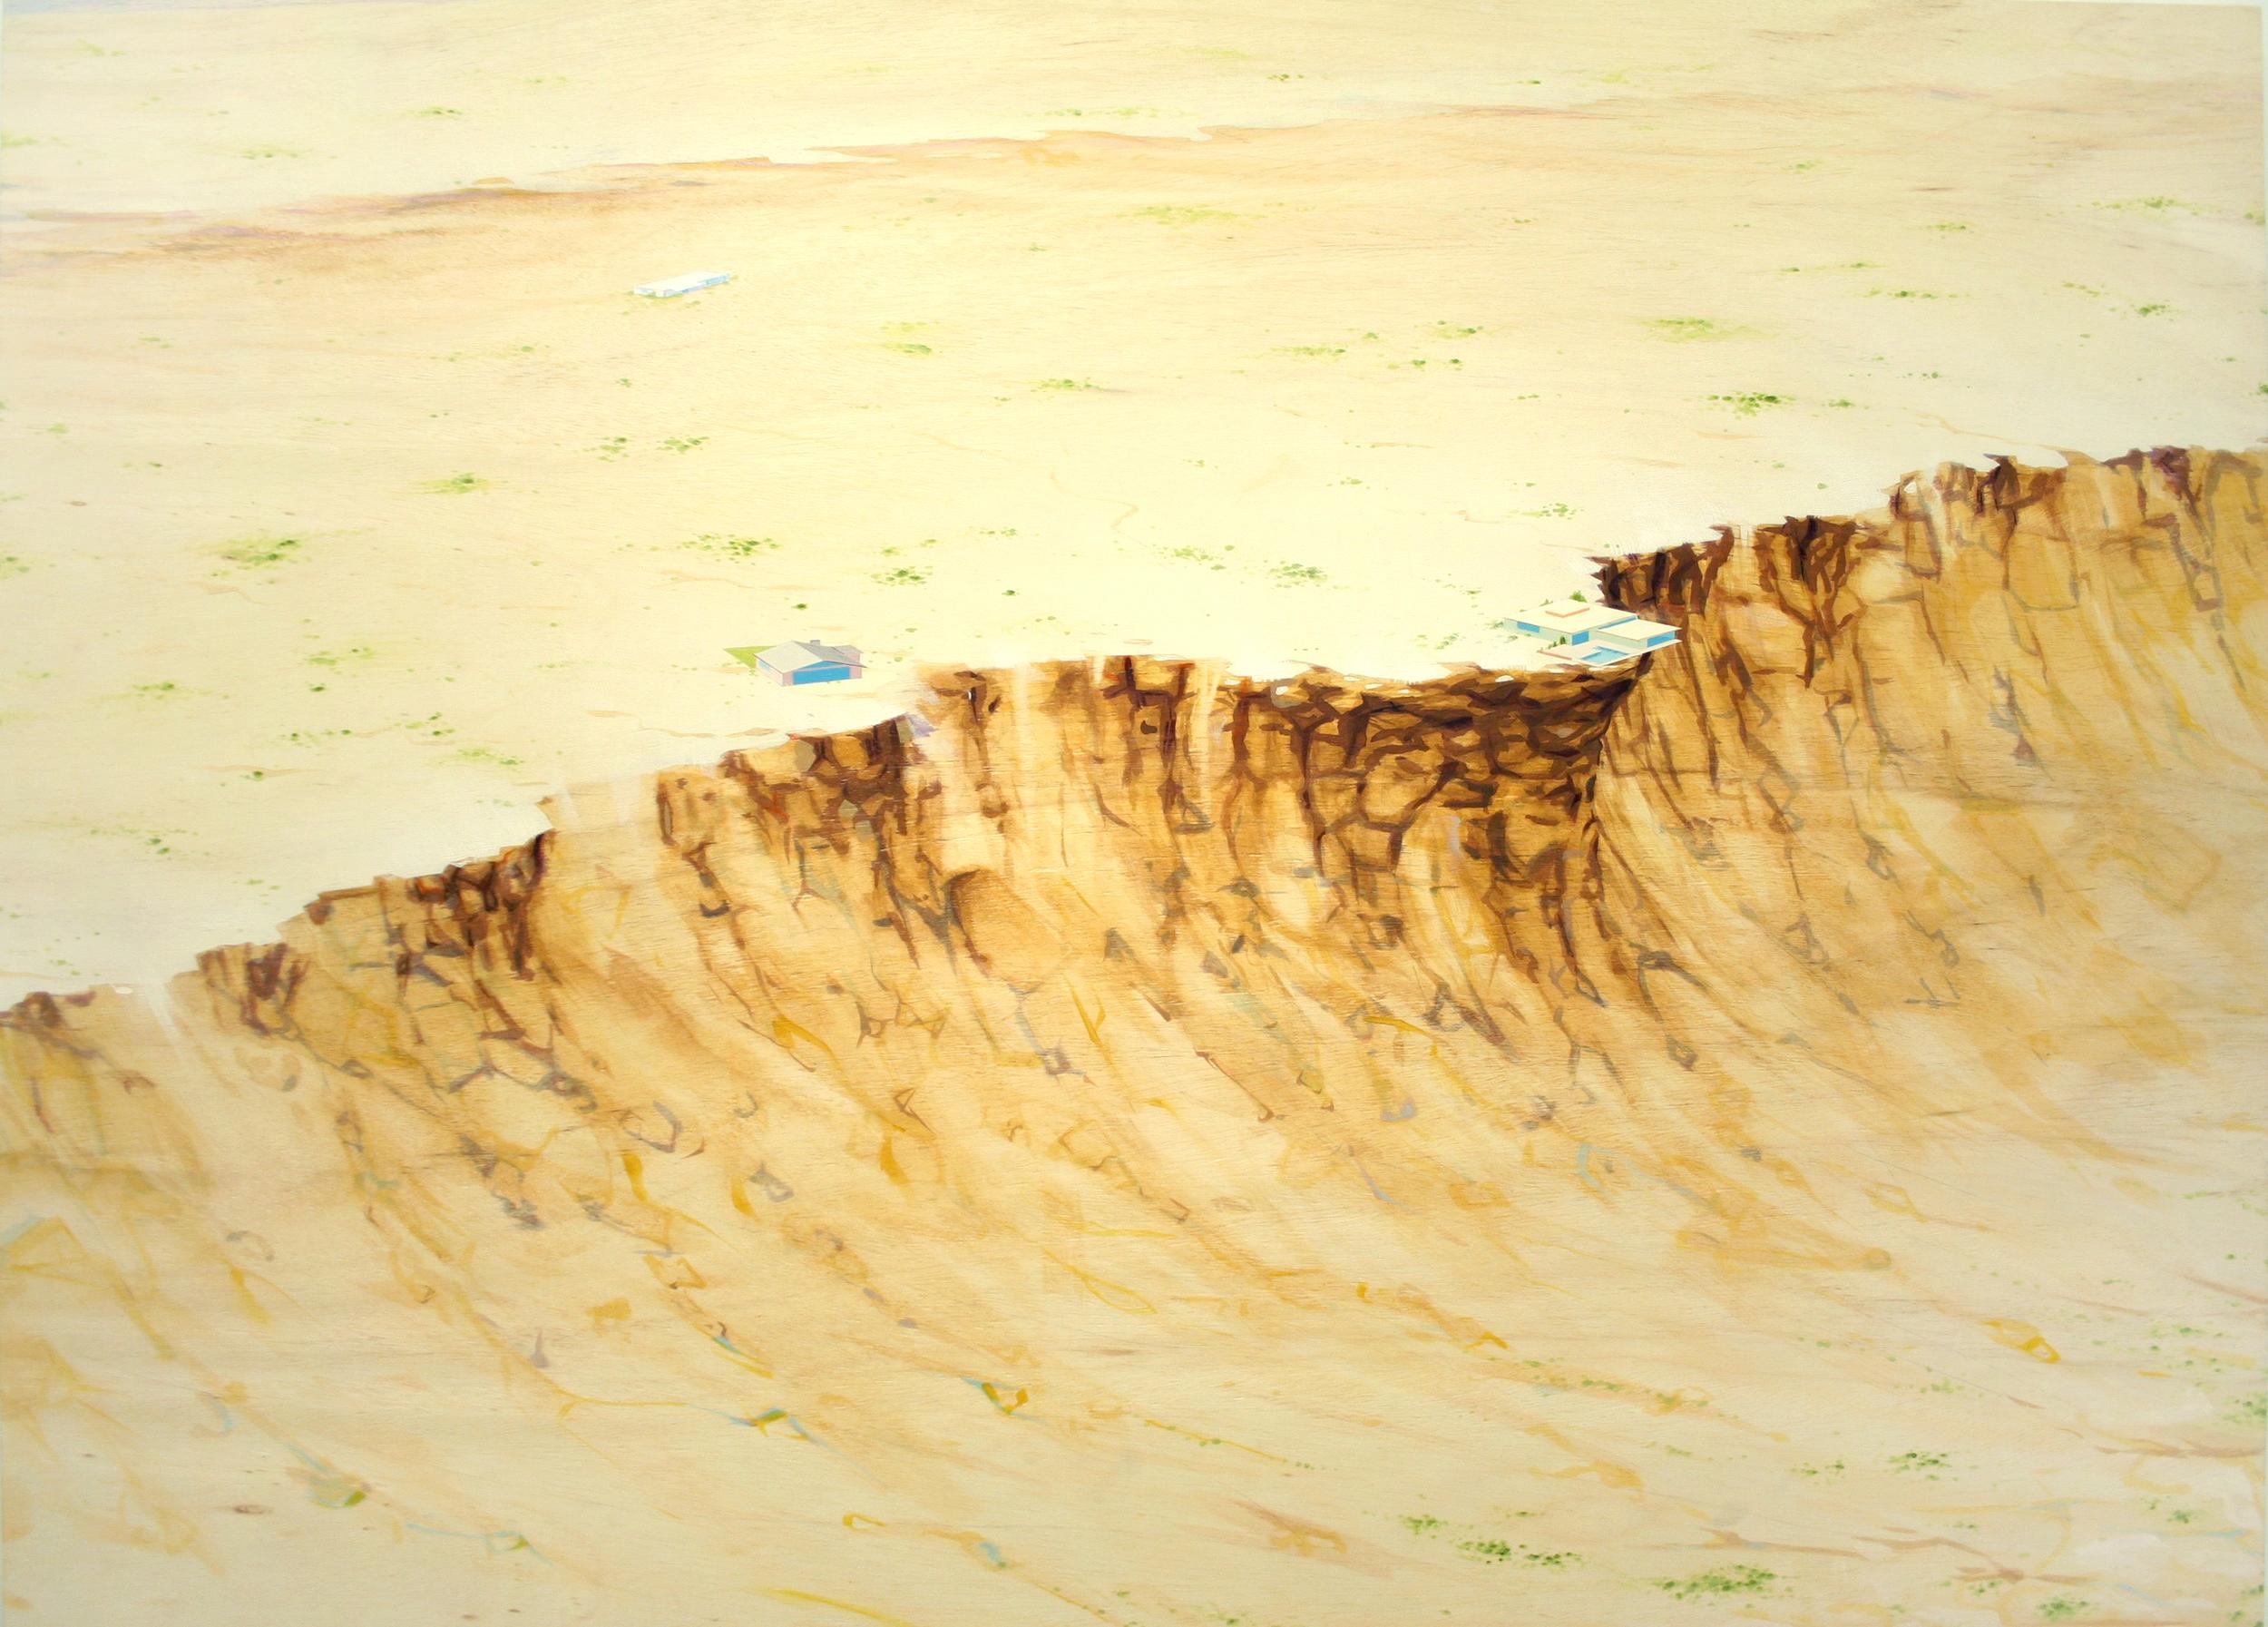 Chris Ballantyne   Over The Falls  2015 acrylic on panel 48 x 64 in